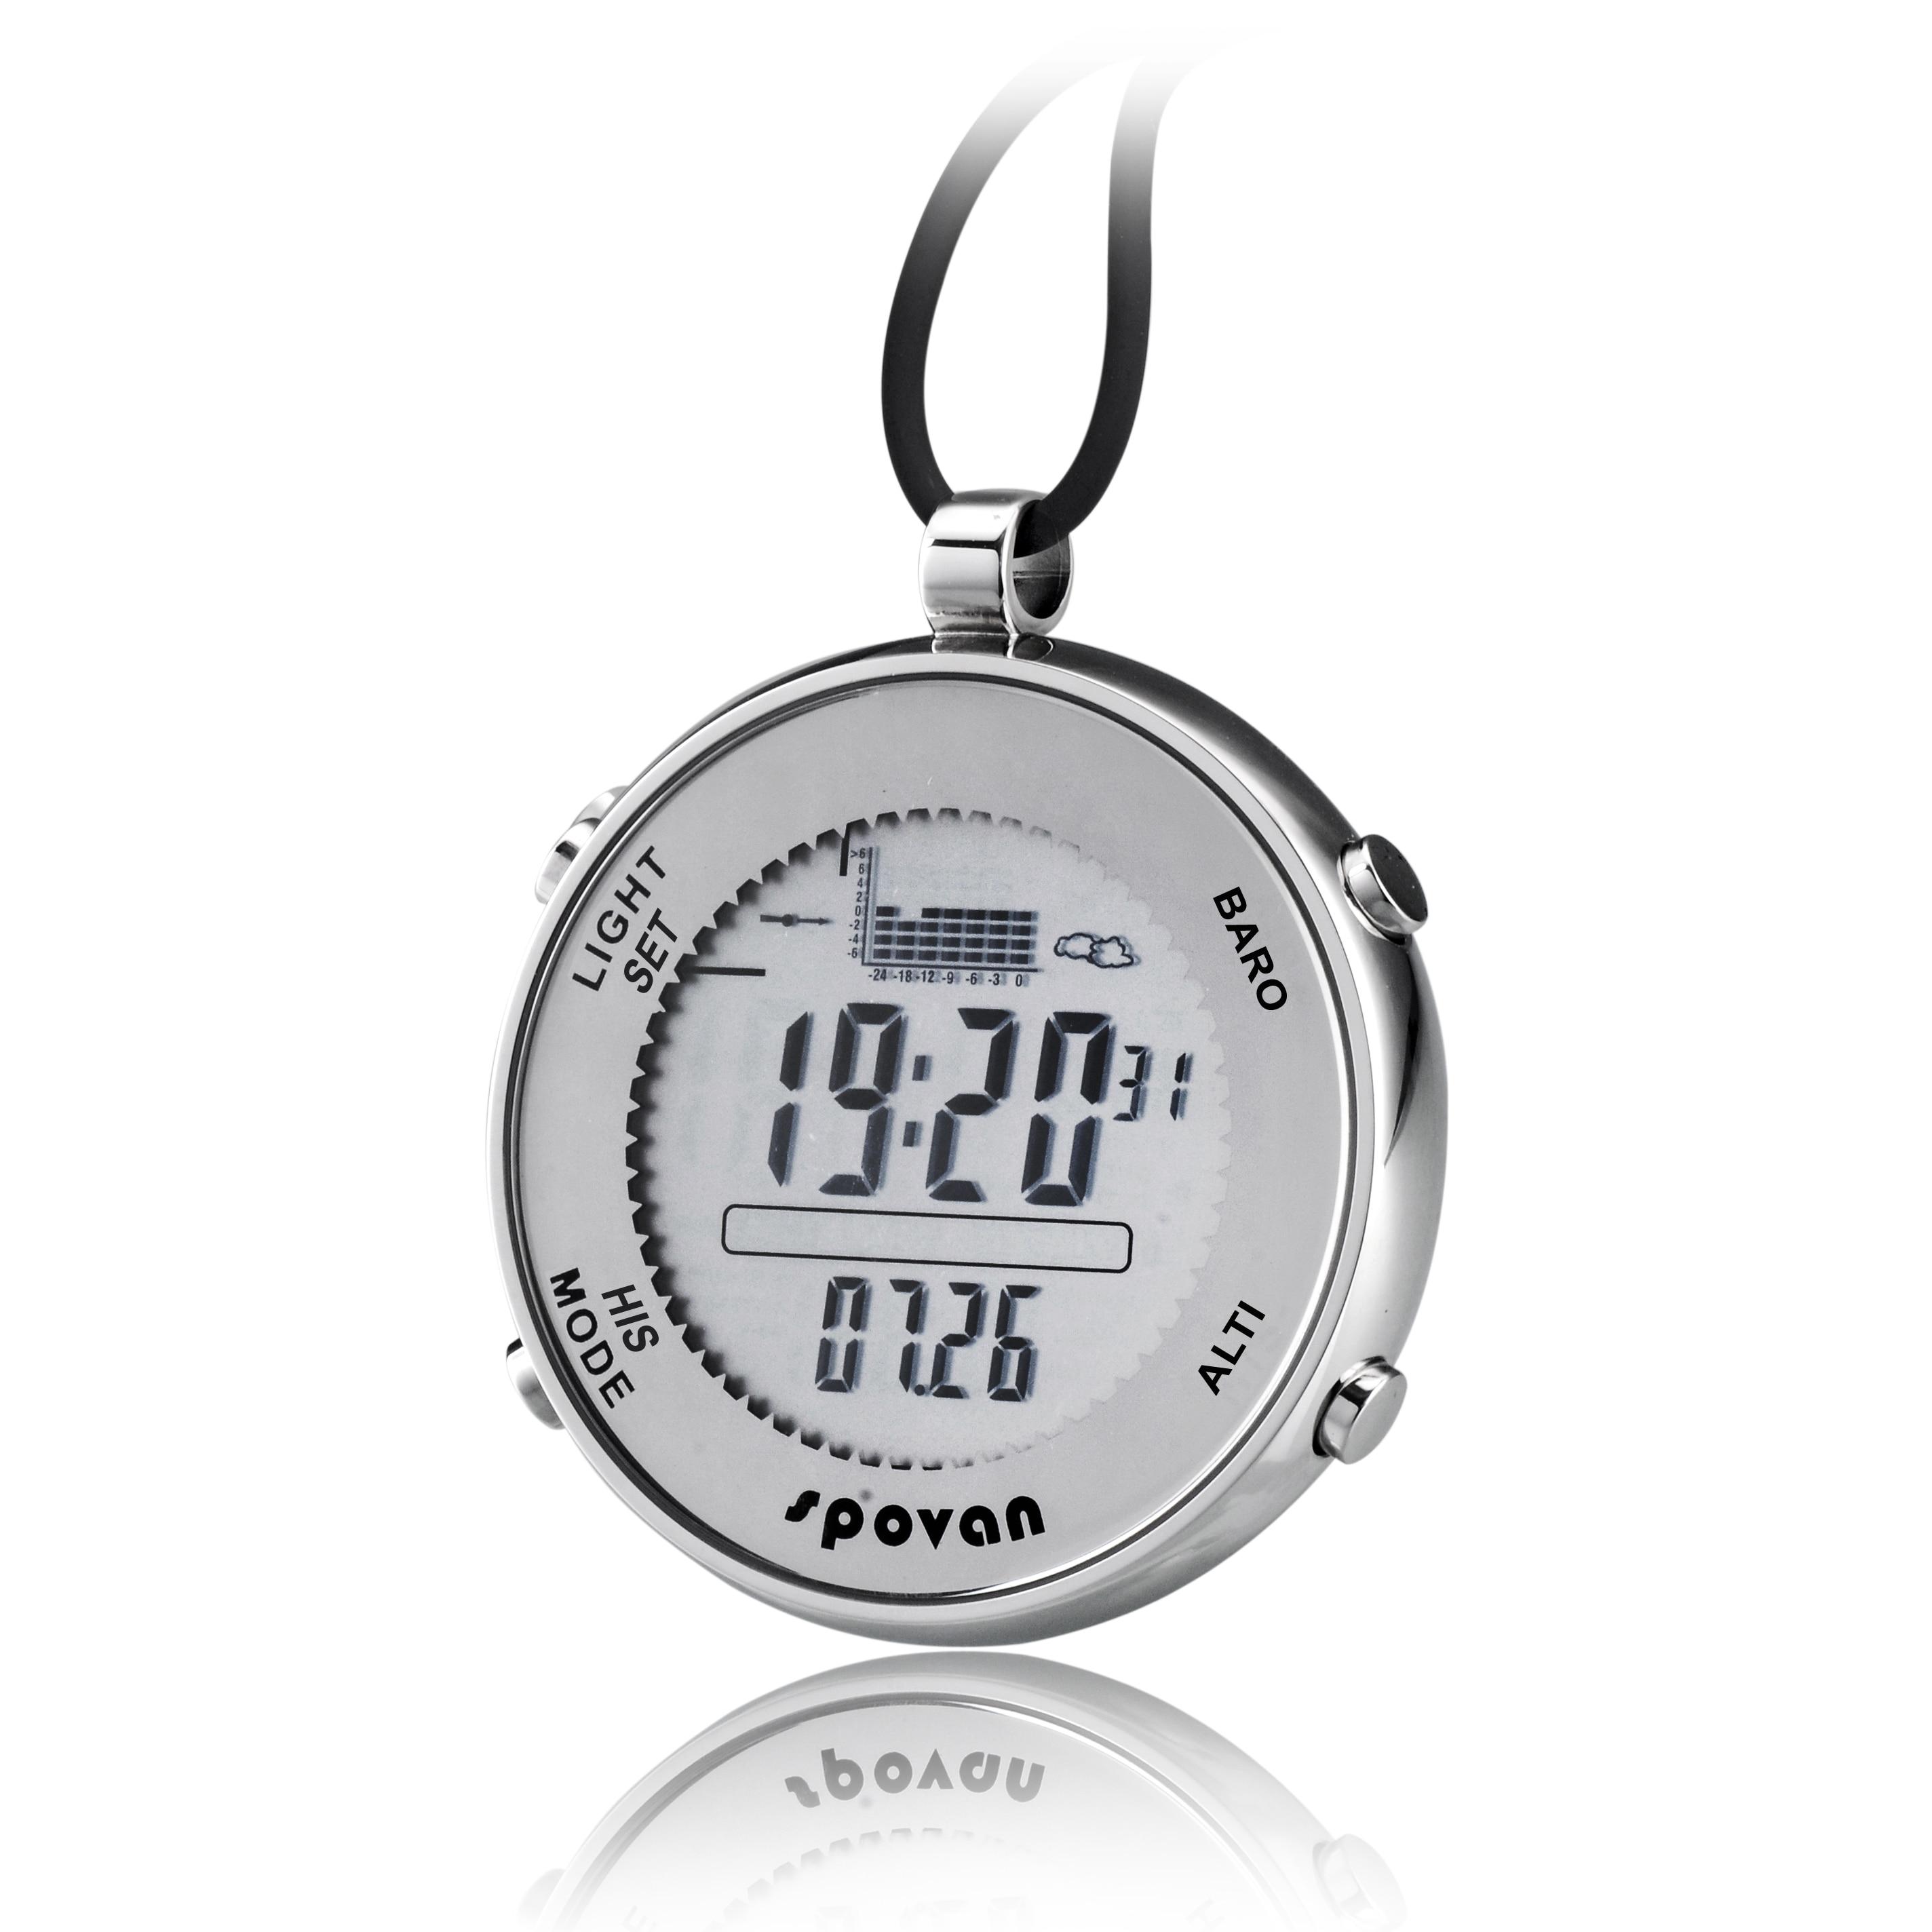 Digital Watches Multifunction Waterproof Spovan Watch Altimeter Compass Stopwatch Fishing Barometer Outdoor Sports Watch dl-o03